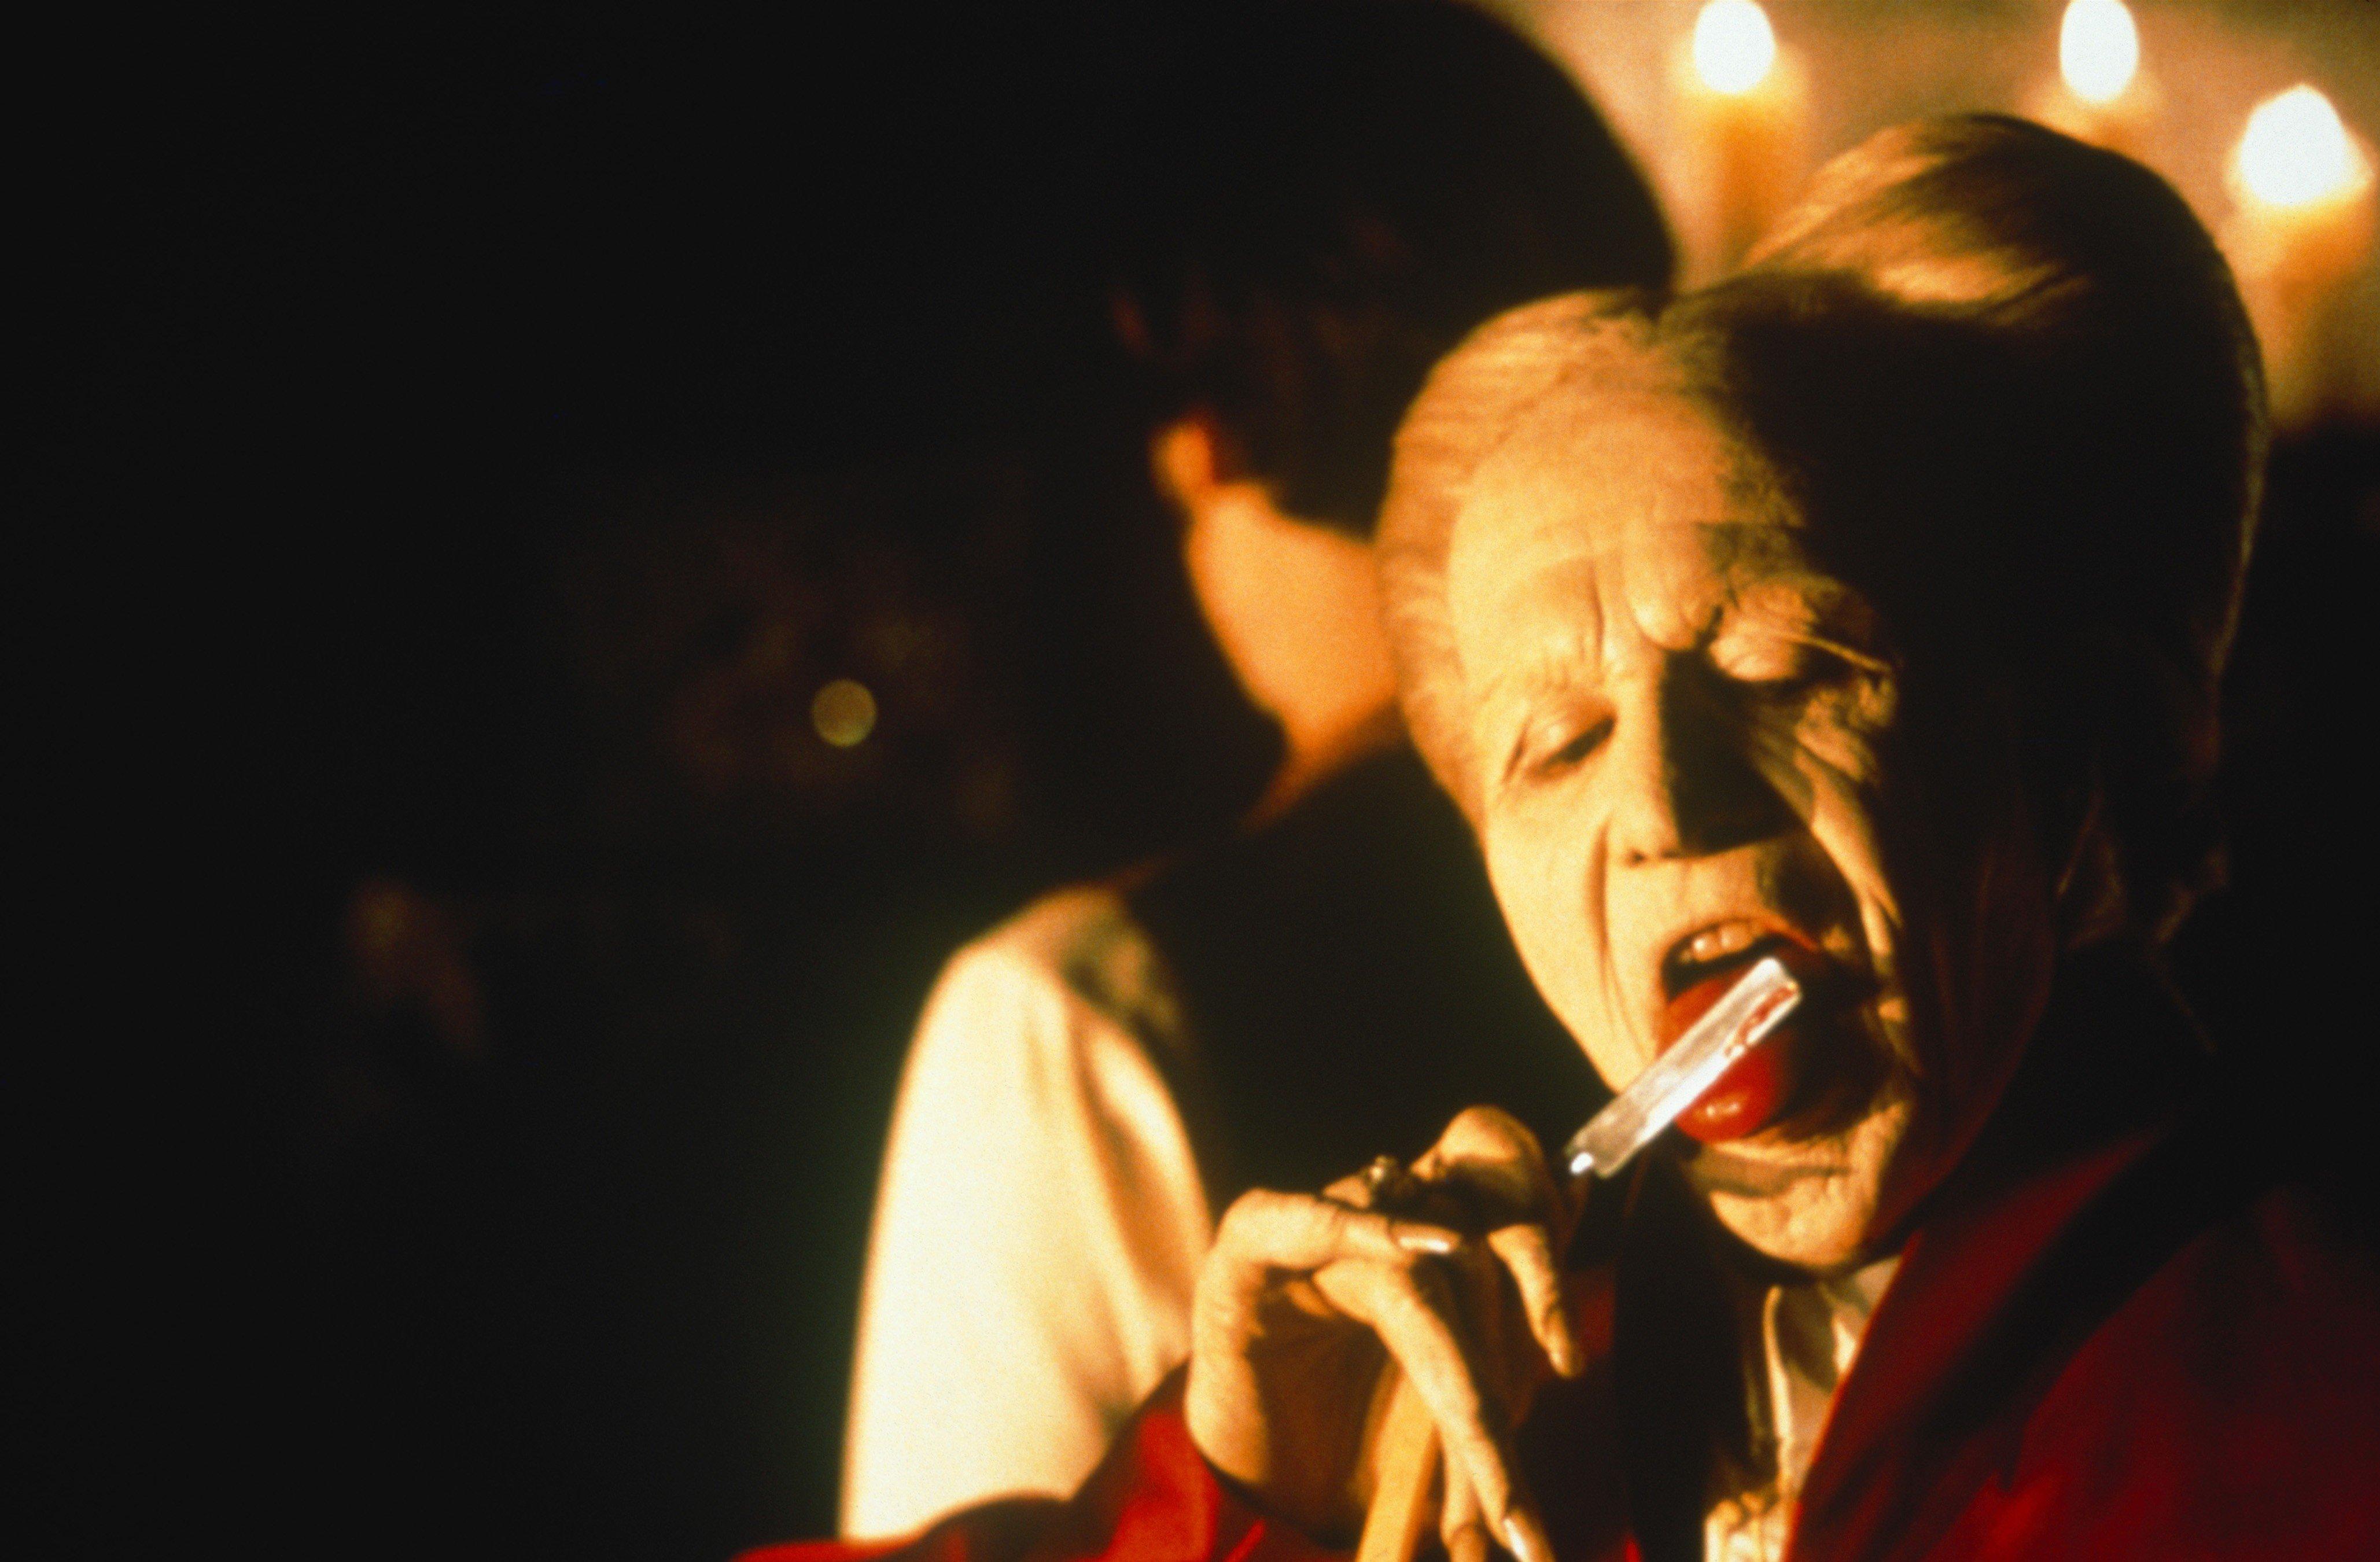 Francis Ford Coppola S Erotic Vampire Movie Bram Stoker S Dracula 1992 Still Shocks And Seduces South China Morning Post